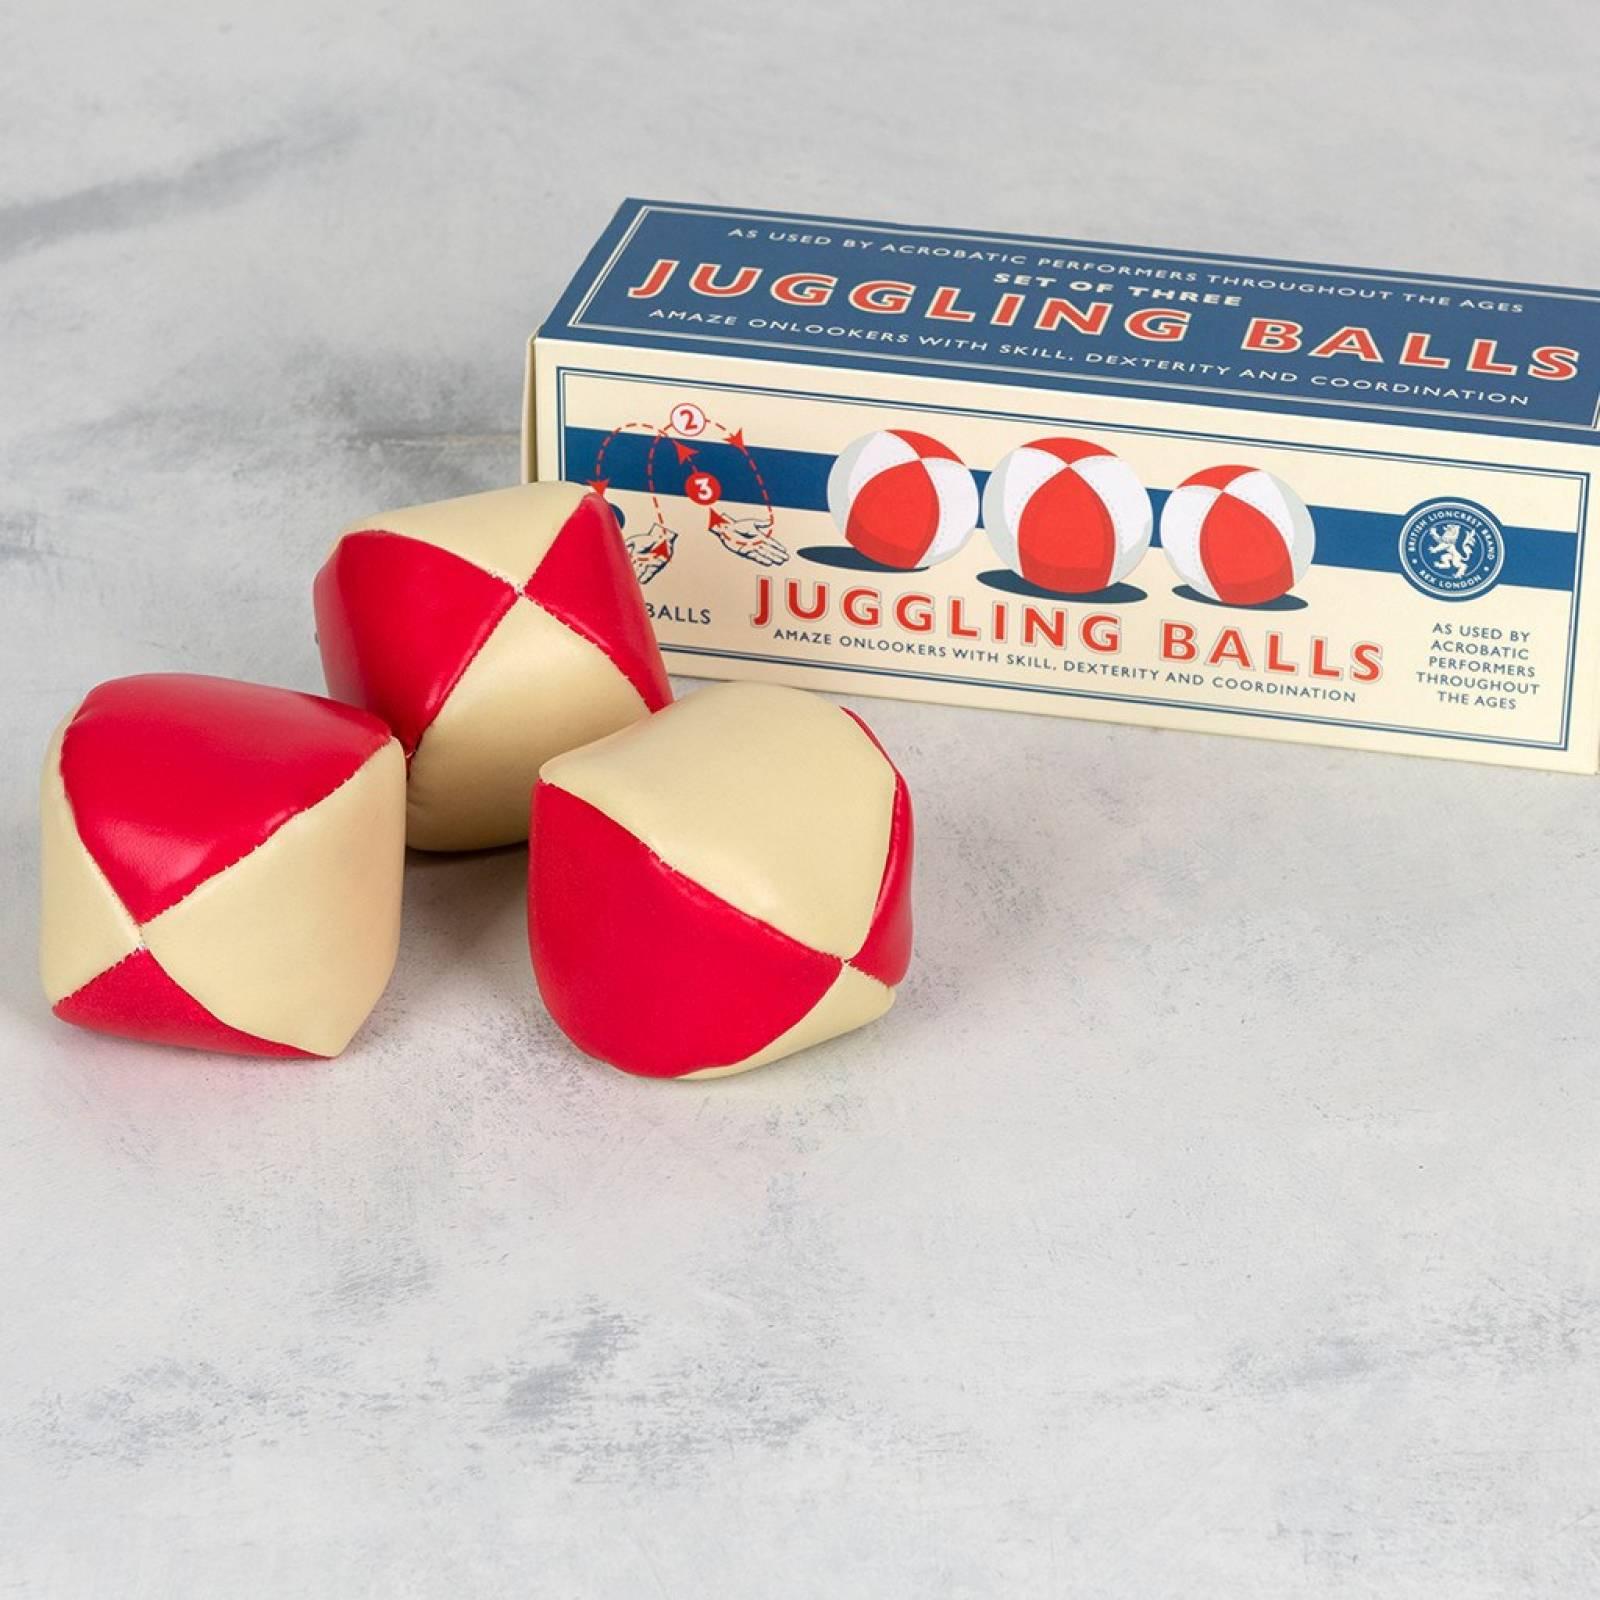 Set of 3 Juggling Balls In Retro Box thumbnails